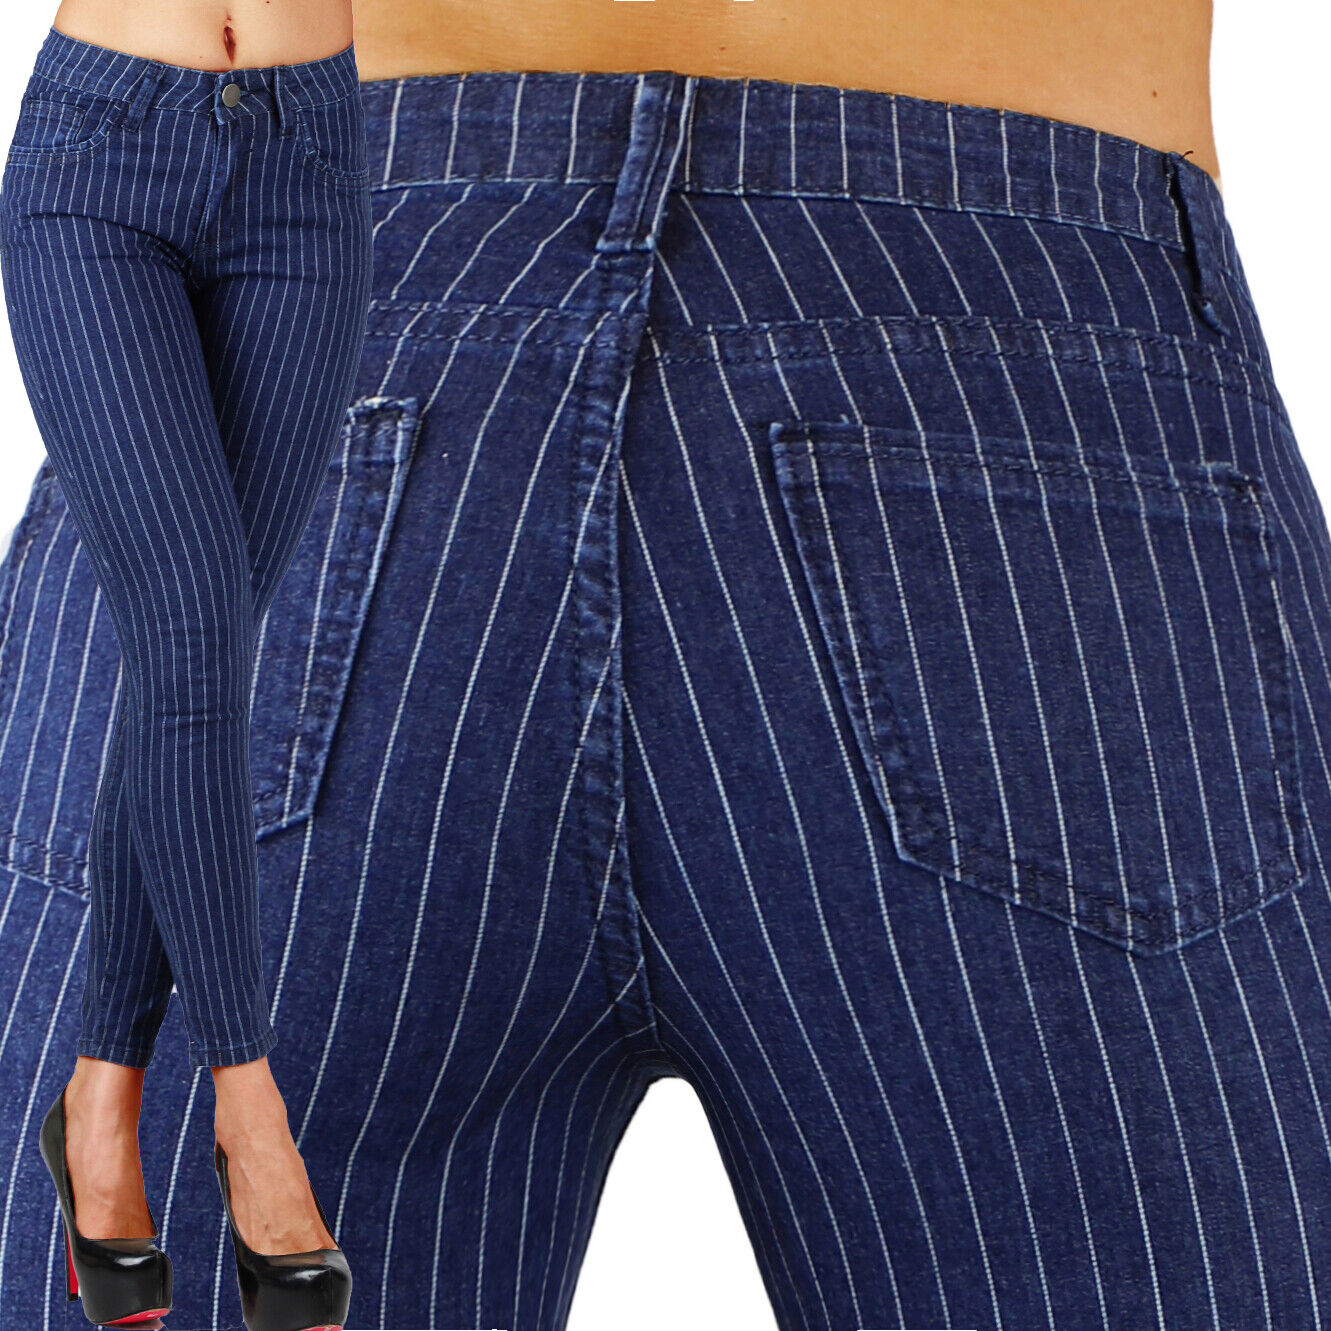 Sexy Stretchy Navy Blue Office  Jeans Trousers Skinny Slim W